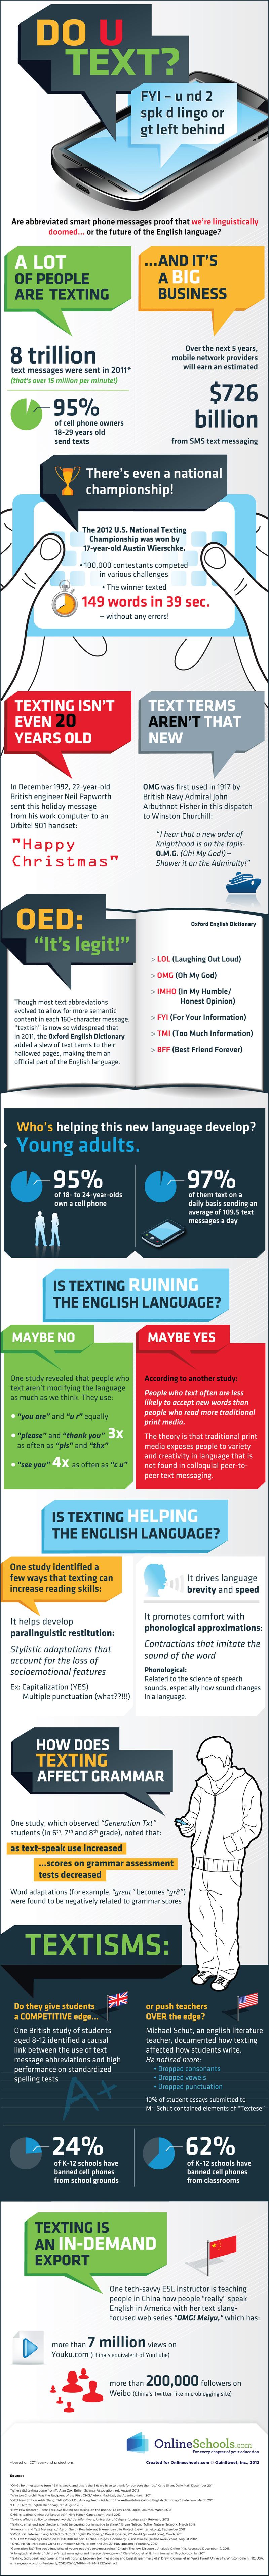 Do you Text